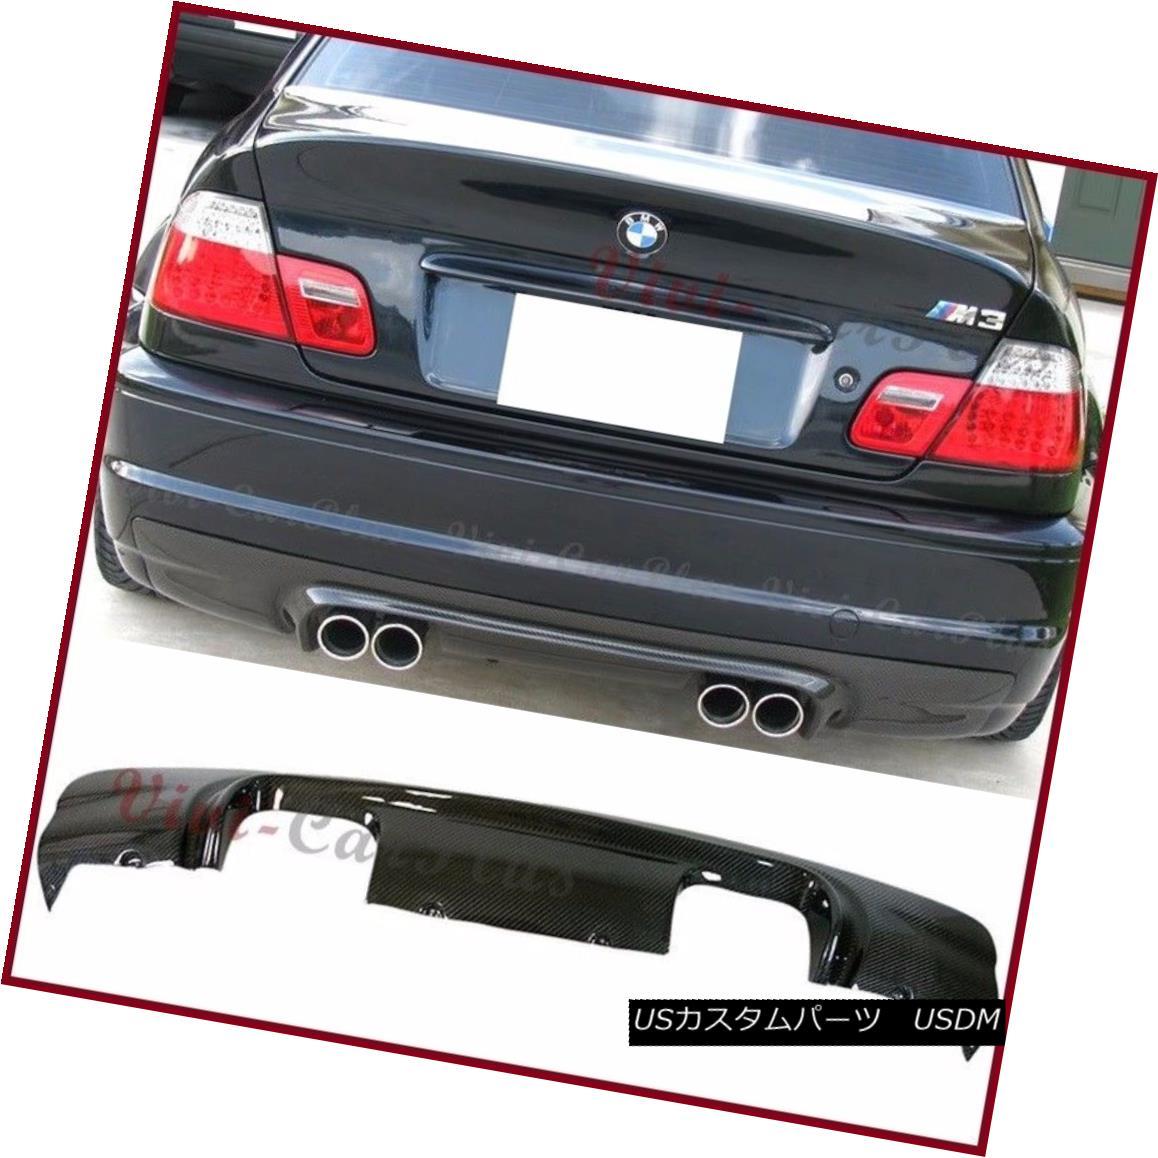 Fiber E46 Replace 2001年6月E46 エアロパーツ CS Look Rear 2001-06 Spoiler For BMW M3カーボンファイバーCSバックリアバンパーディフューザー交換 Diffuser M3 BMW Bumper Carbon